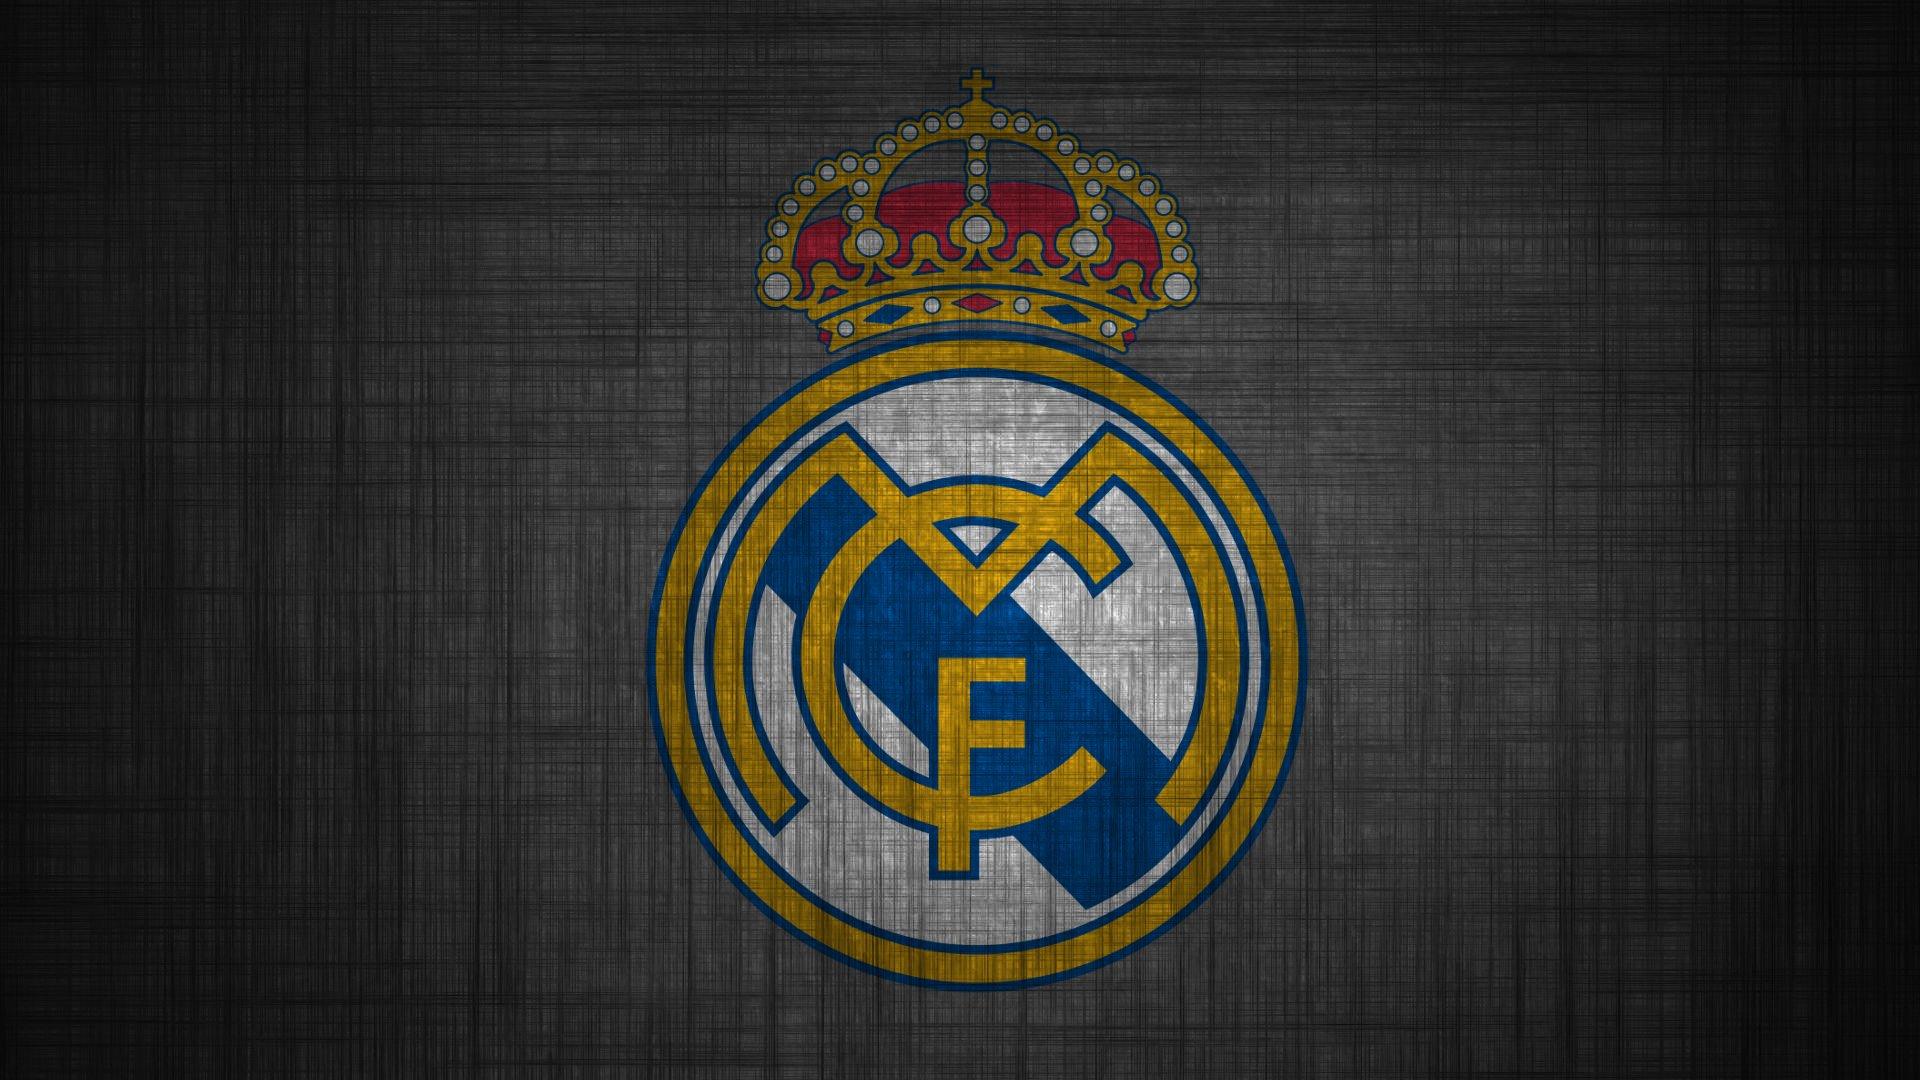 Real Madrid CF Full HD Bakgrund and Bakgrund 1920x1080 ID770527